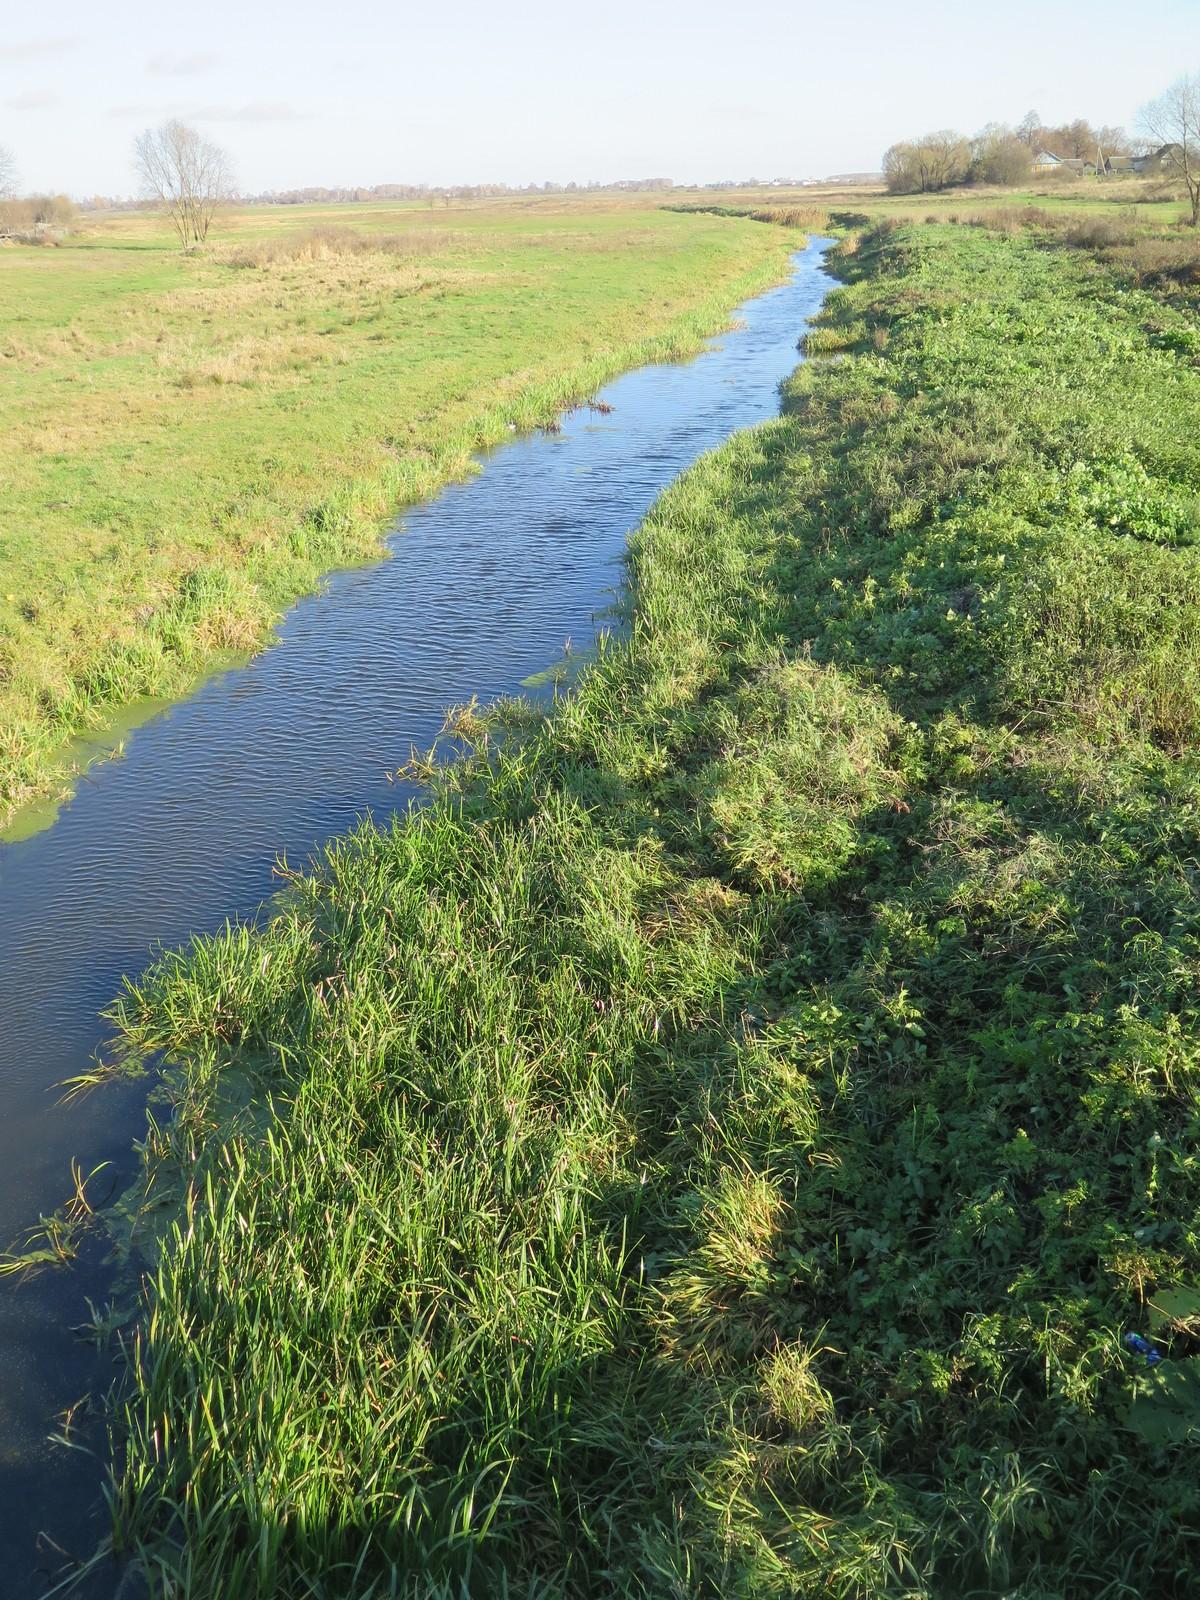 река Ржавка, Рогачевский район